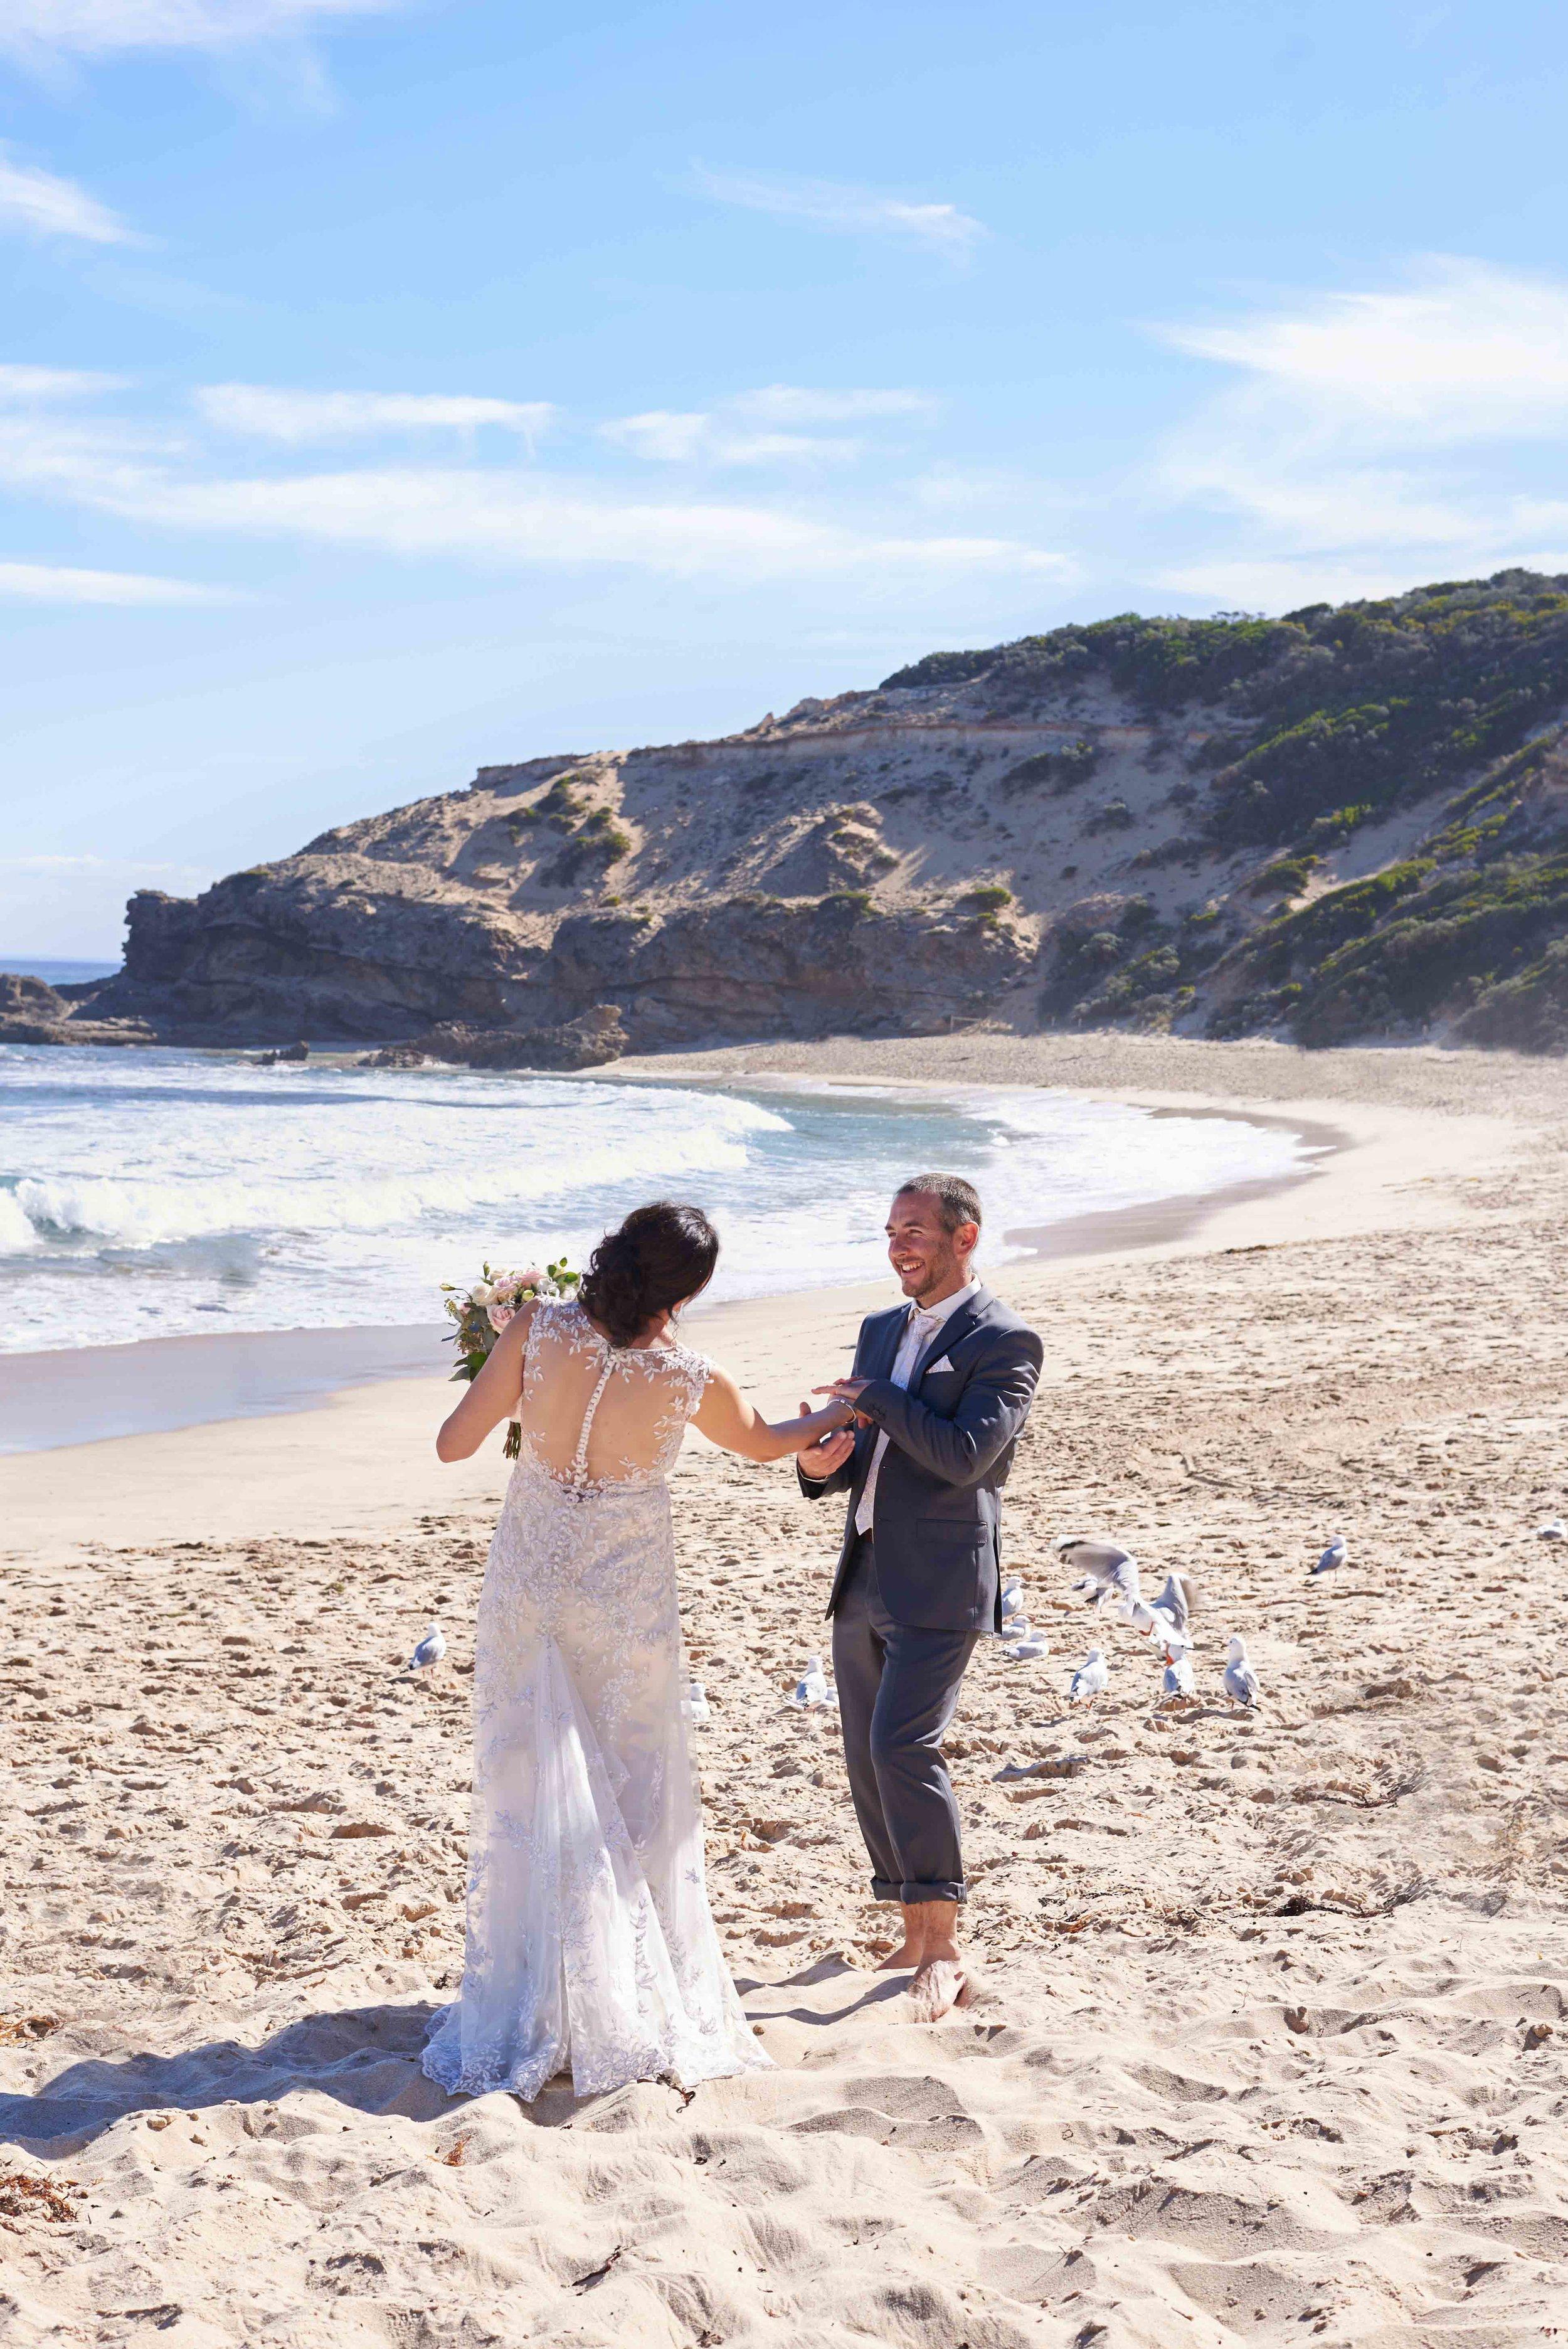 sorrento-wedding-photography-all-smiles-marissa-jade-photography-118.jpg